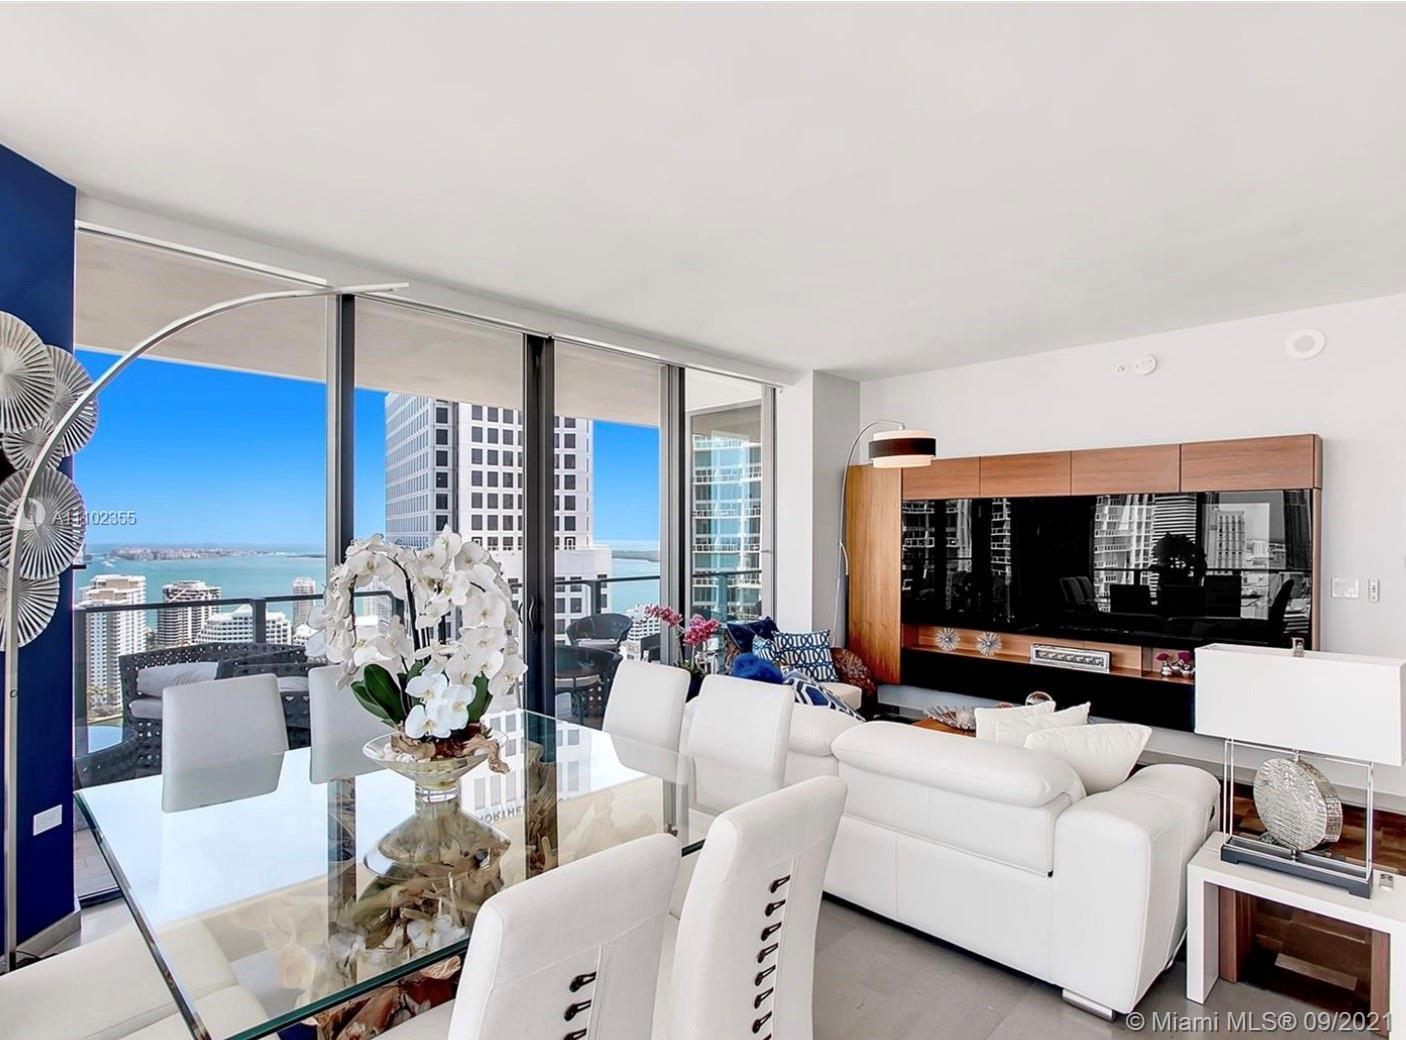 Beautiful 2 bed 2.5 bath corner unit w/ wraparound balcony, oversized bedroom and en-suite baths, go